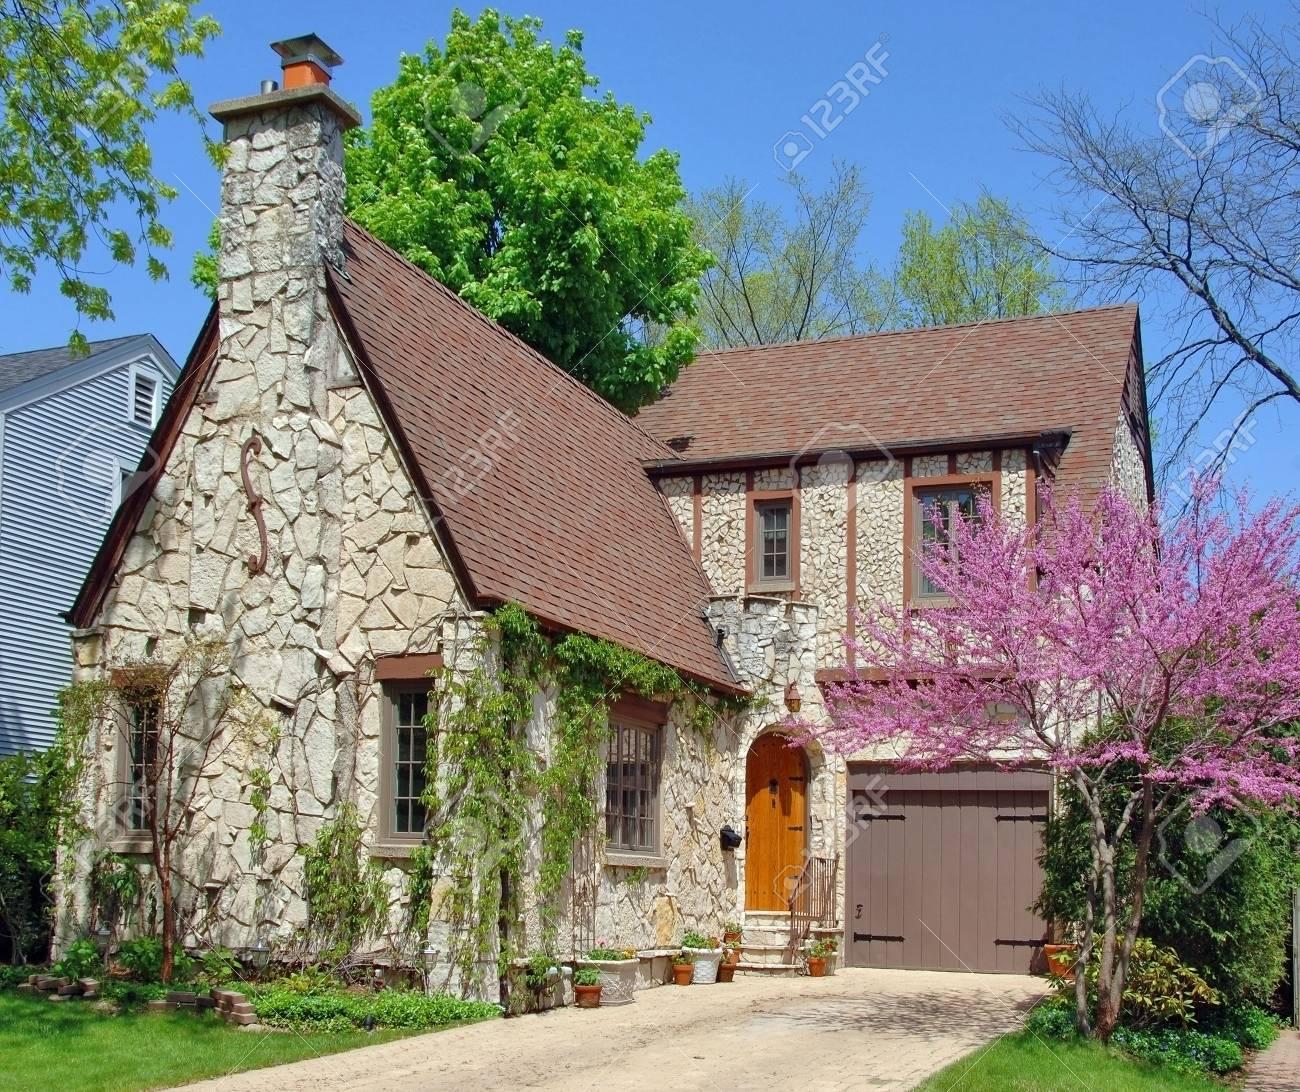 Stone house in a peaceful suburban neighborhood. Springtime. Stock Photo - 4874098